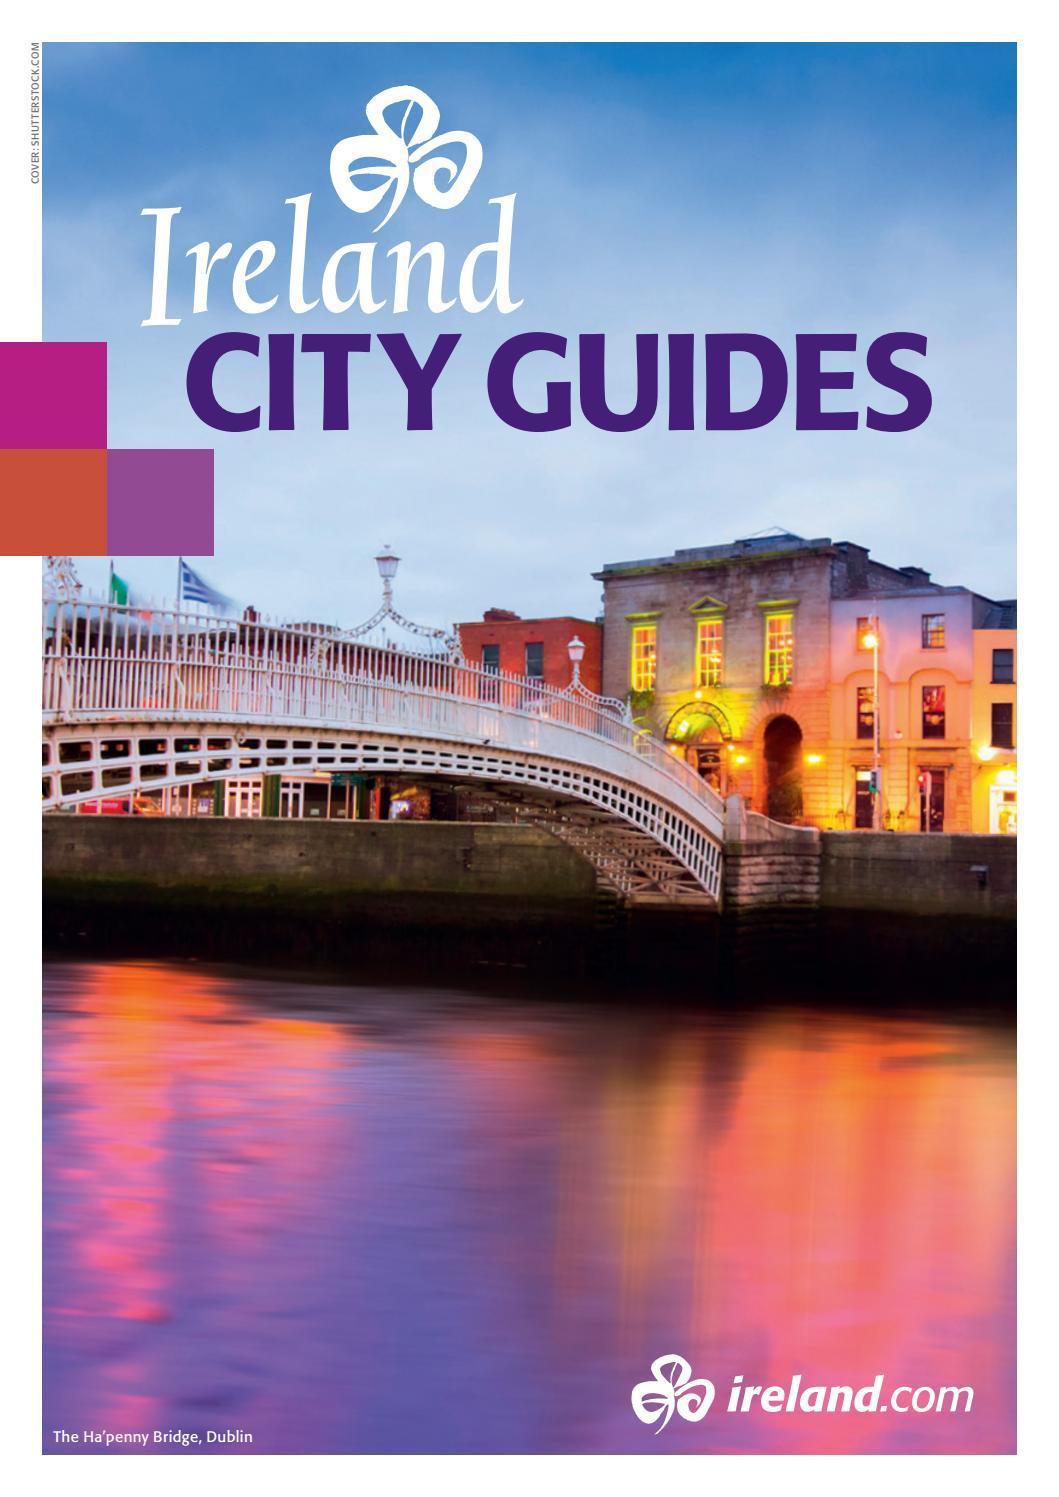 Barry Roche - The Irish Times